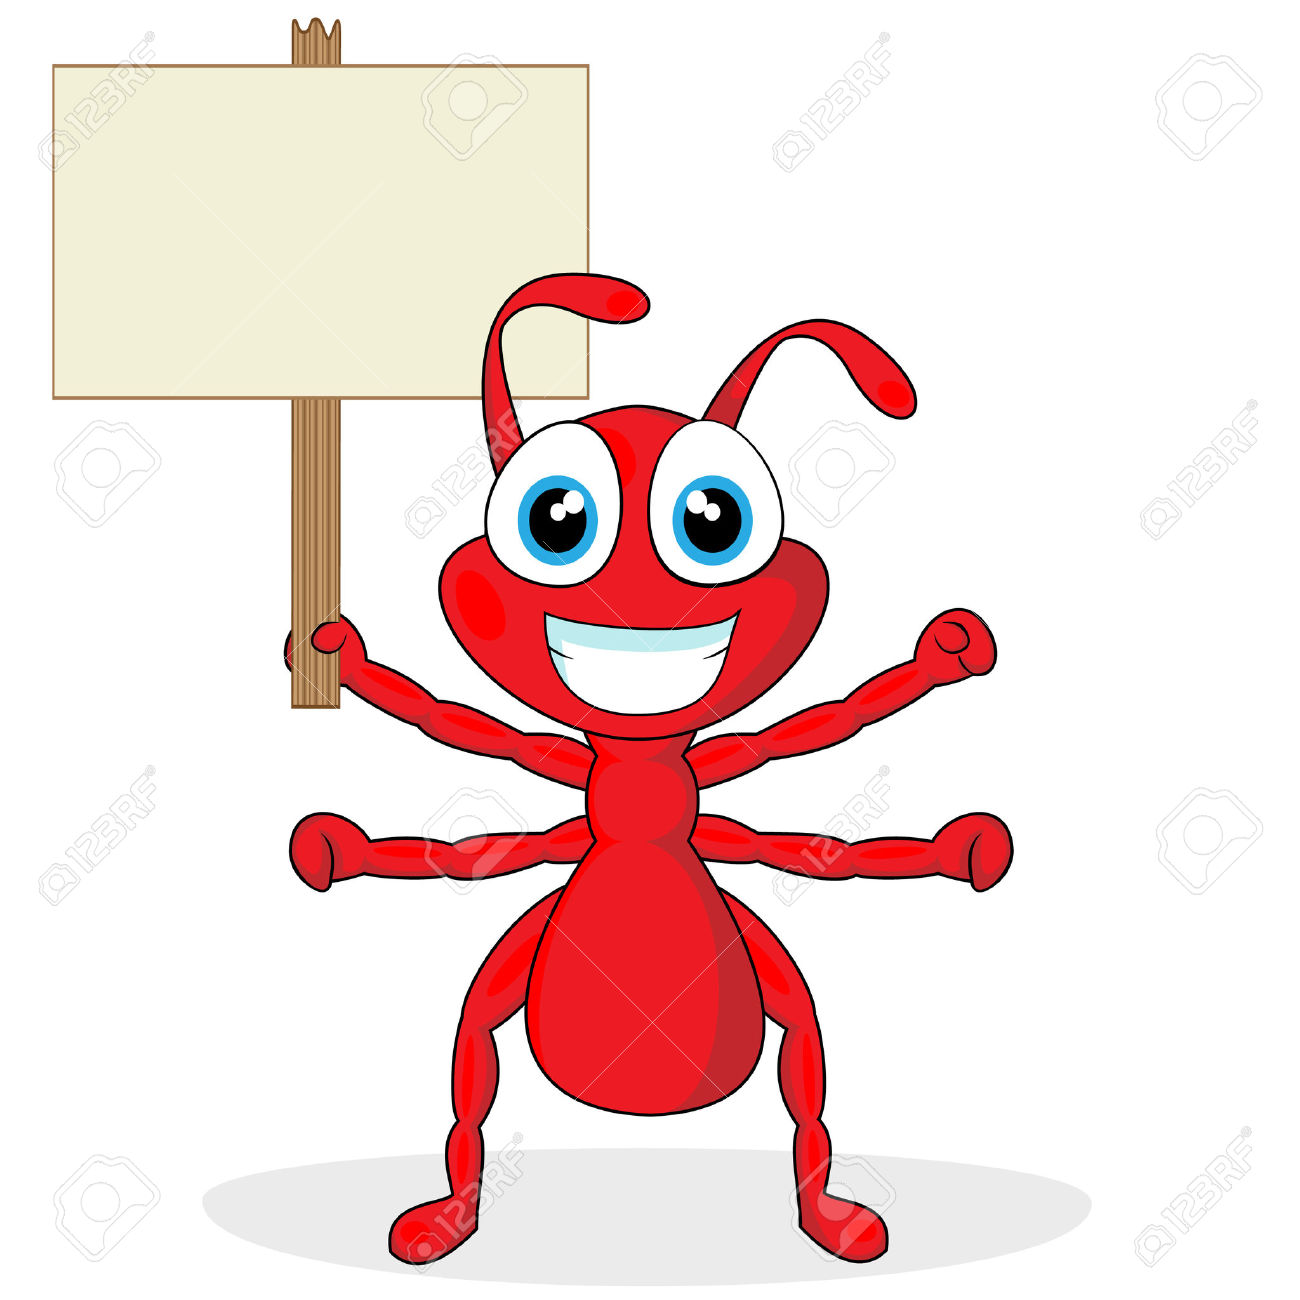 Cute ants clipart